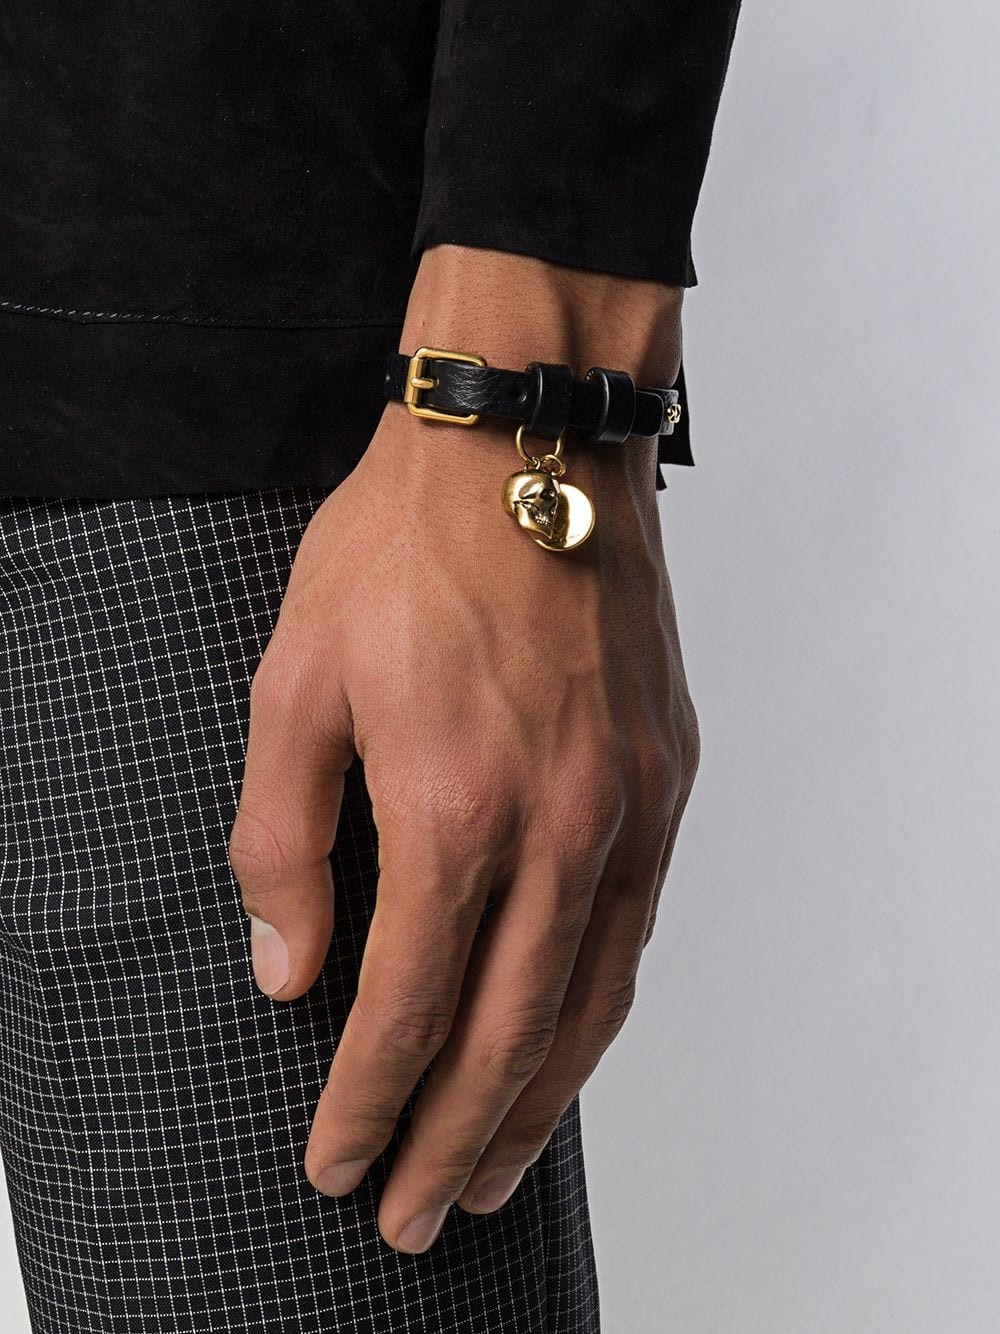 Alexander Mcqueen Bracelet Available On